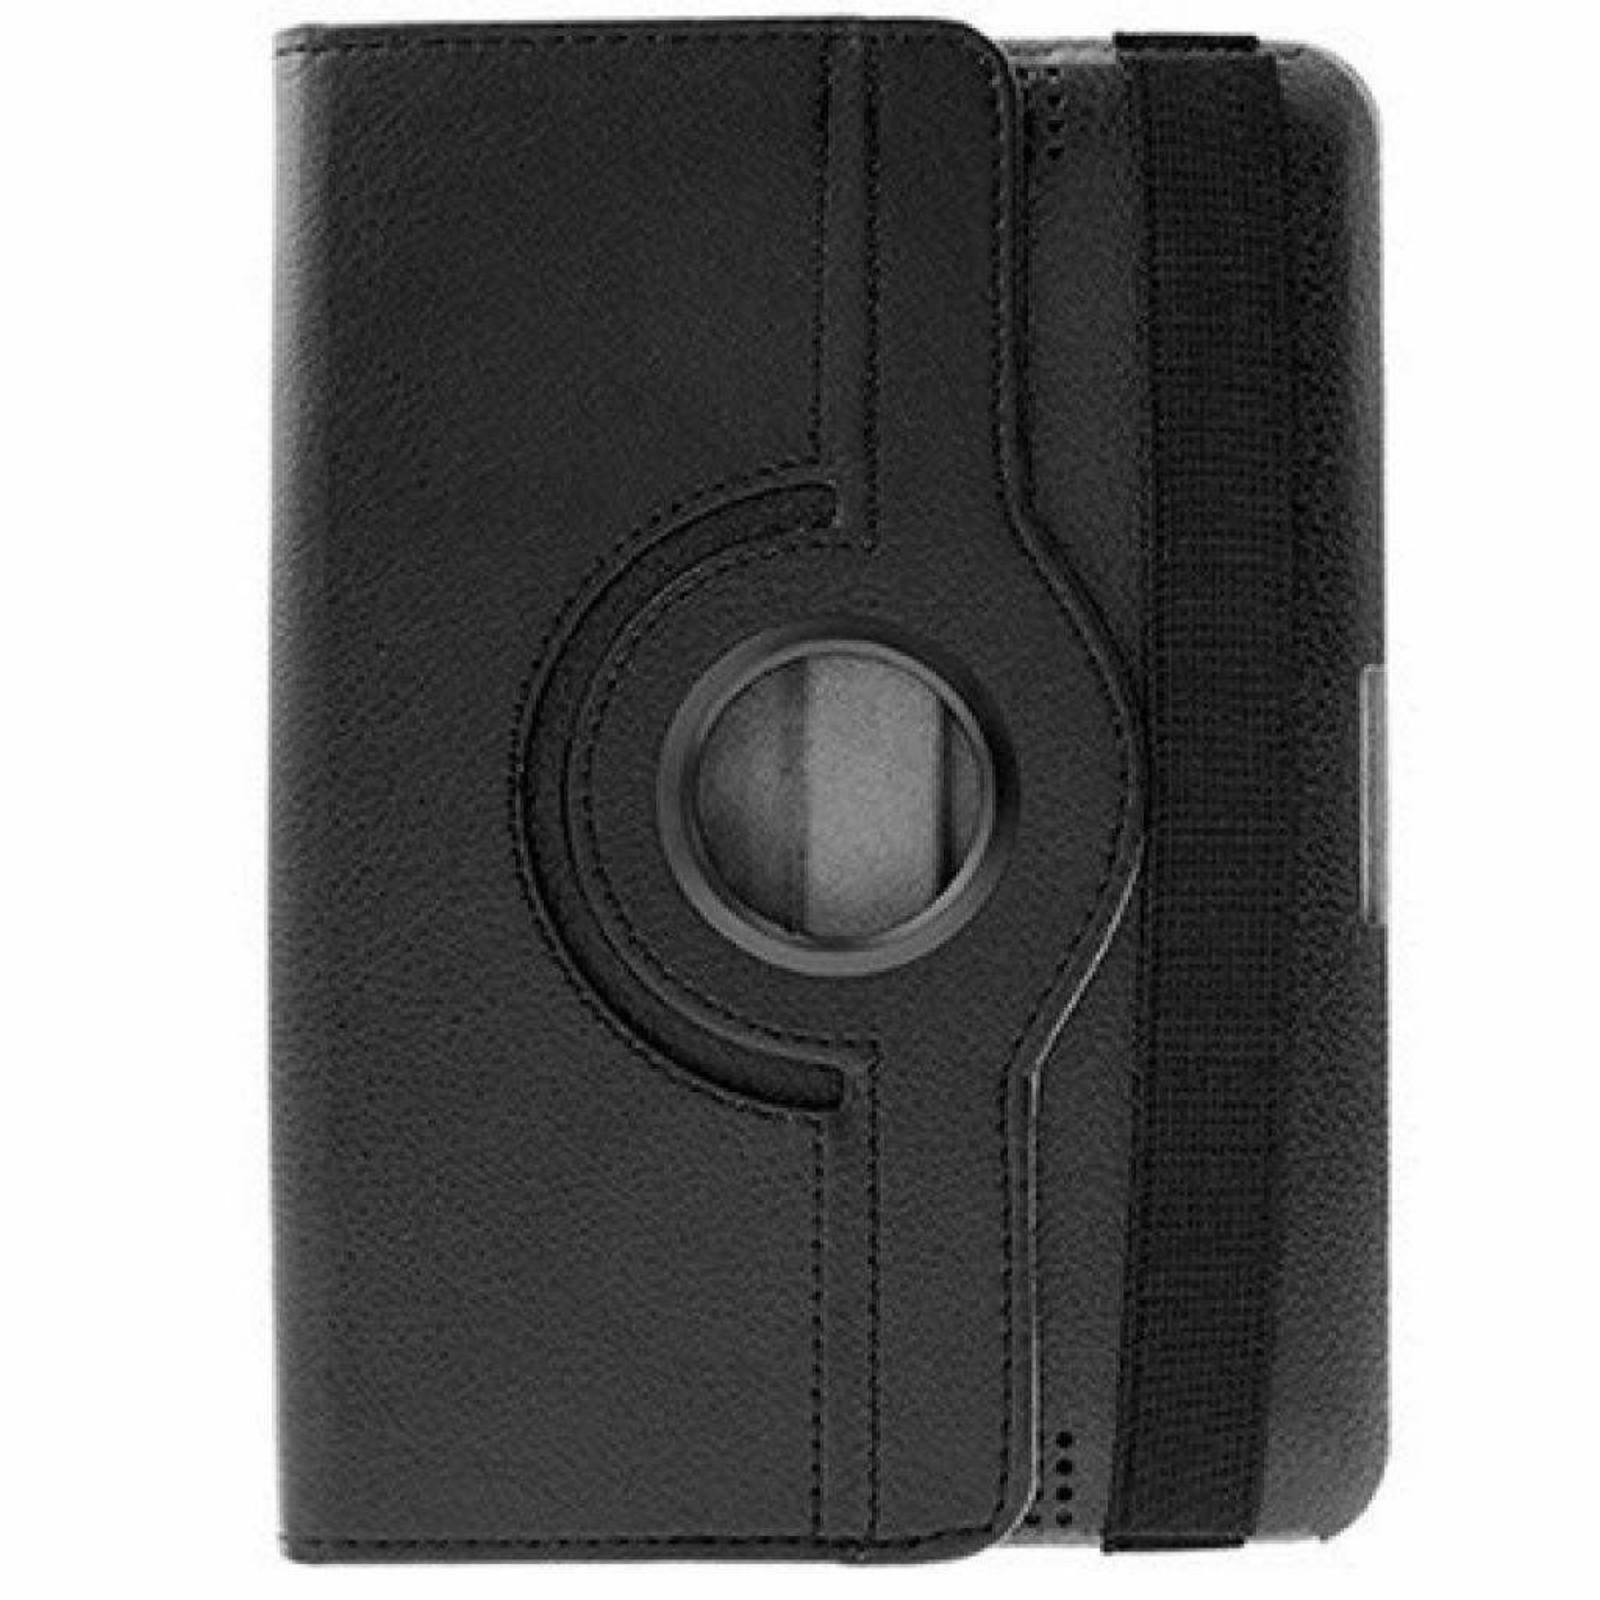 Чехол для планшета Drobak 7 Kindle Fire HD/Black/ ротатор (217101)